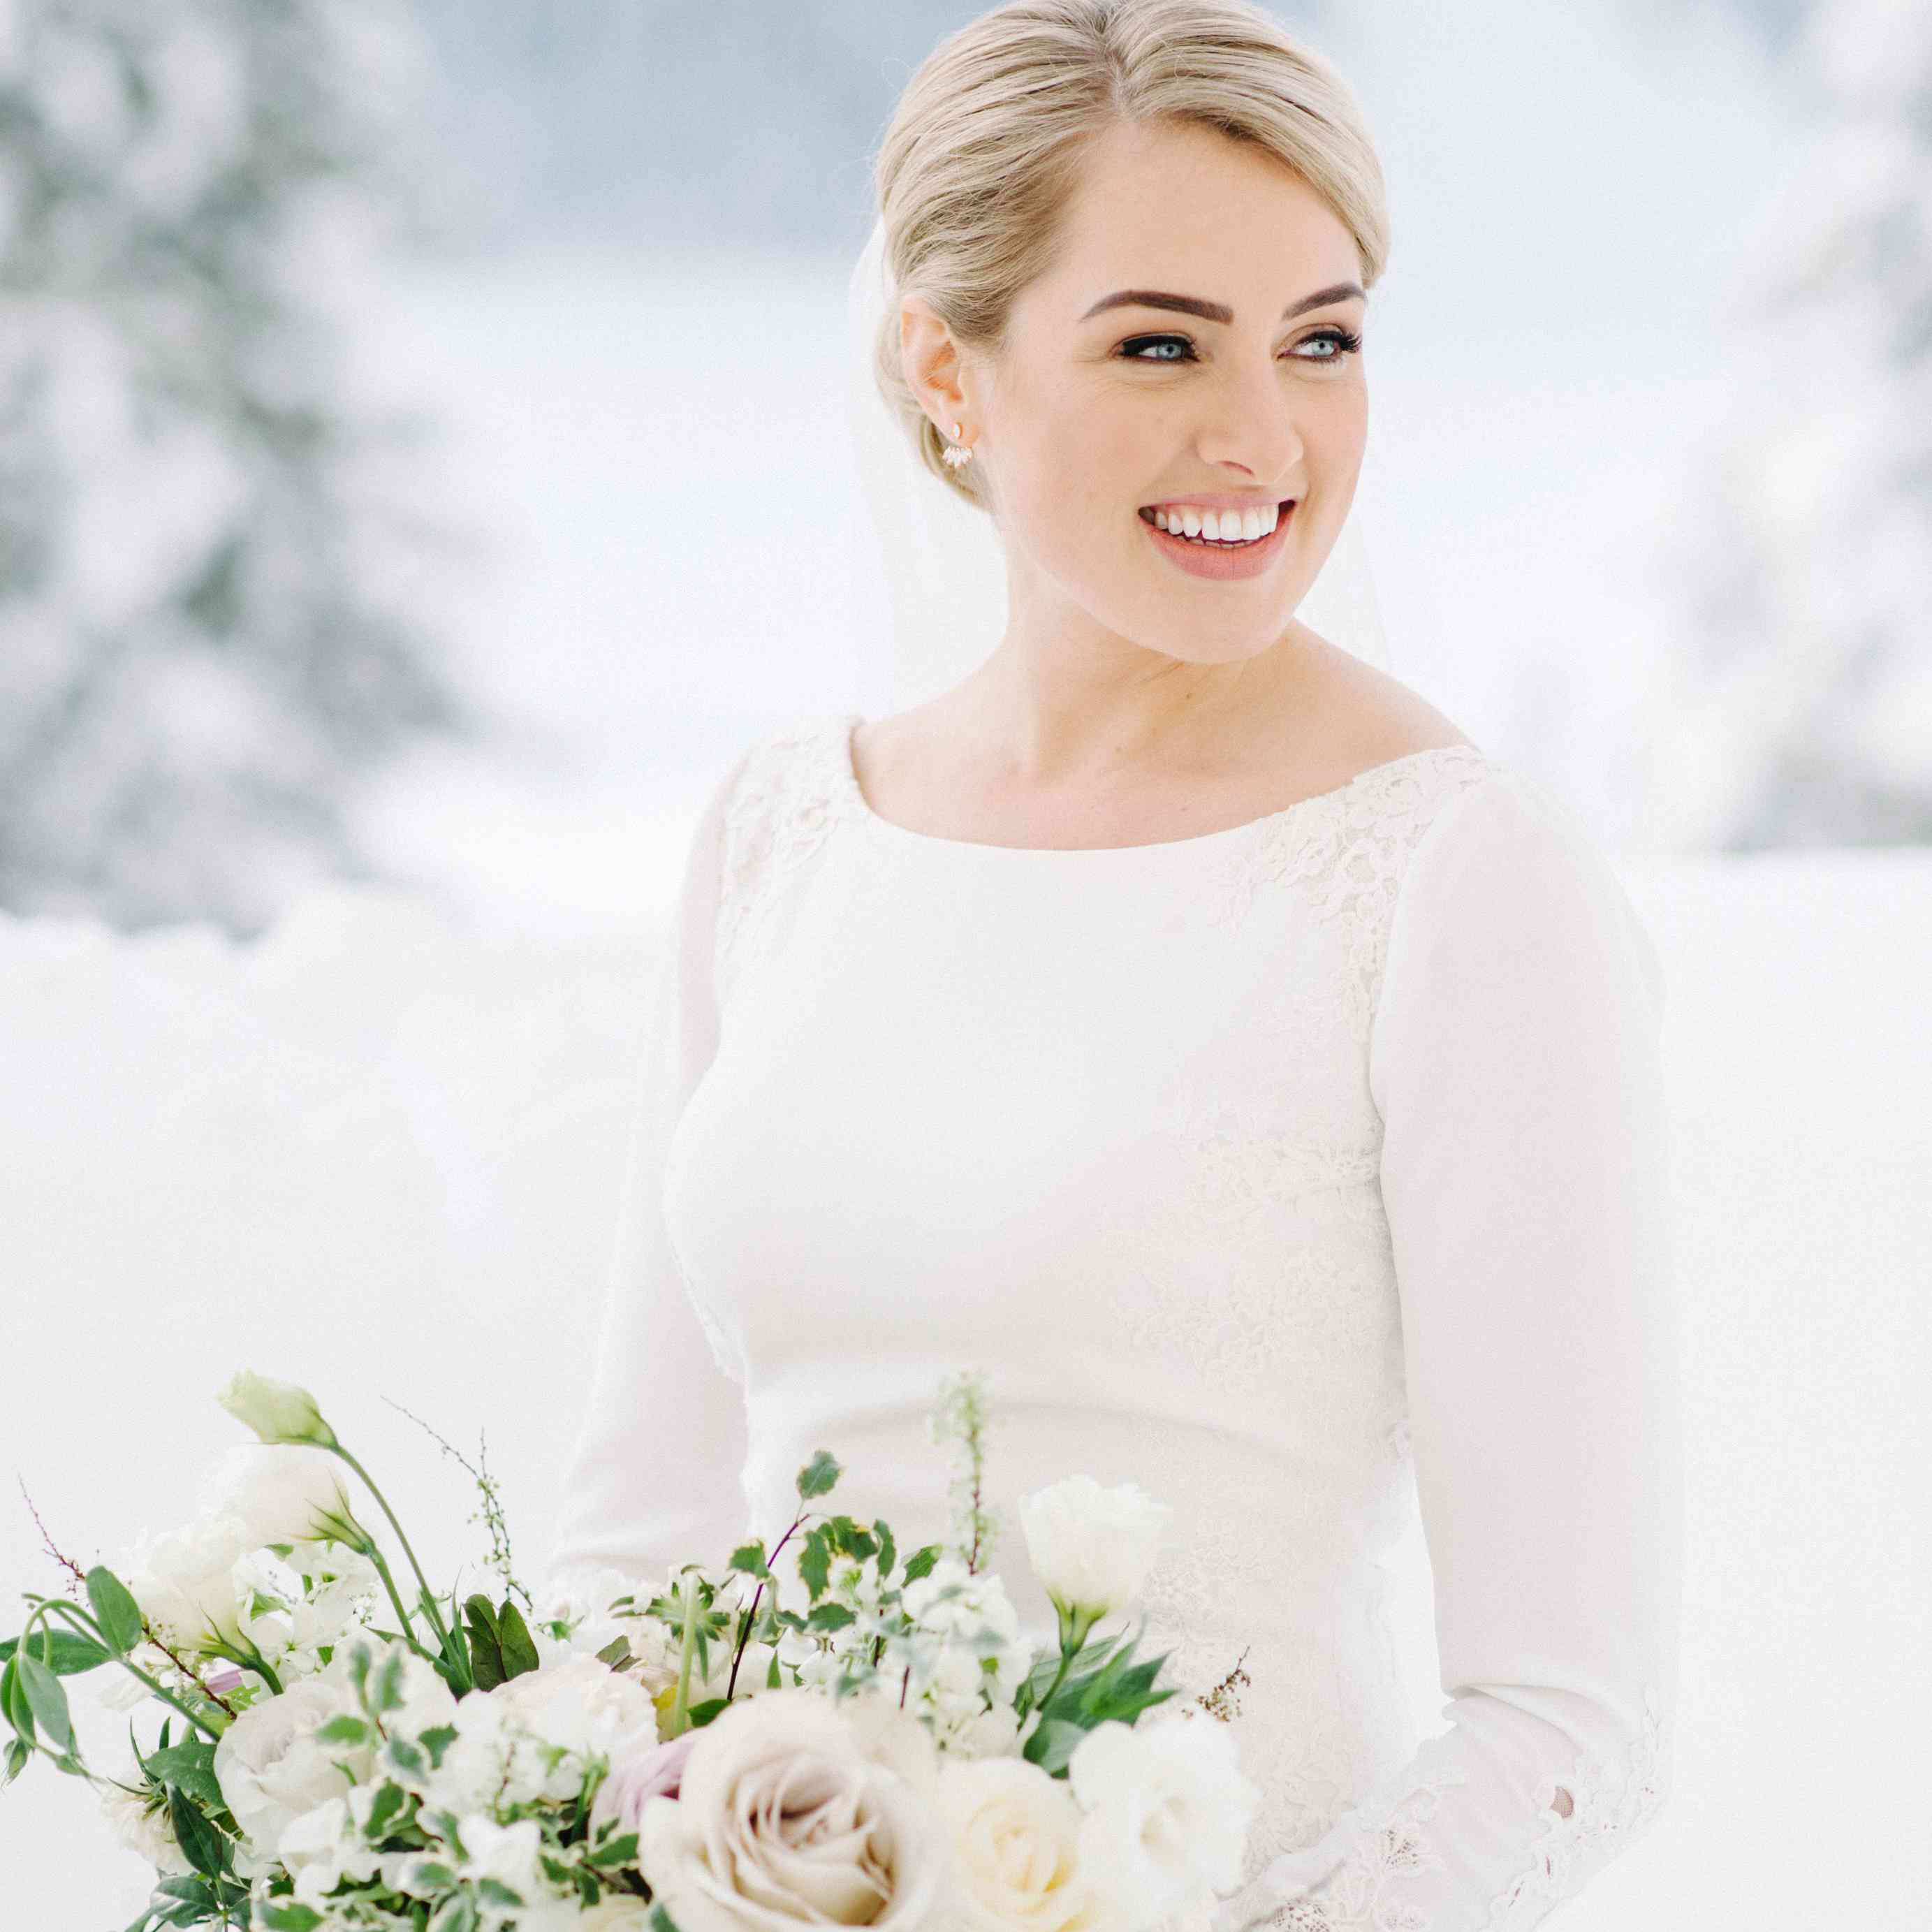 Bridal portrait in winter